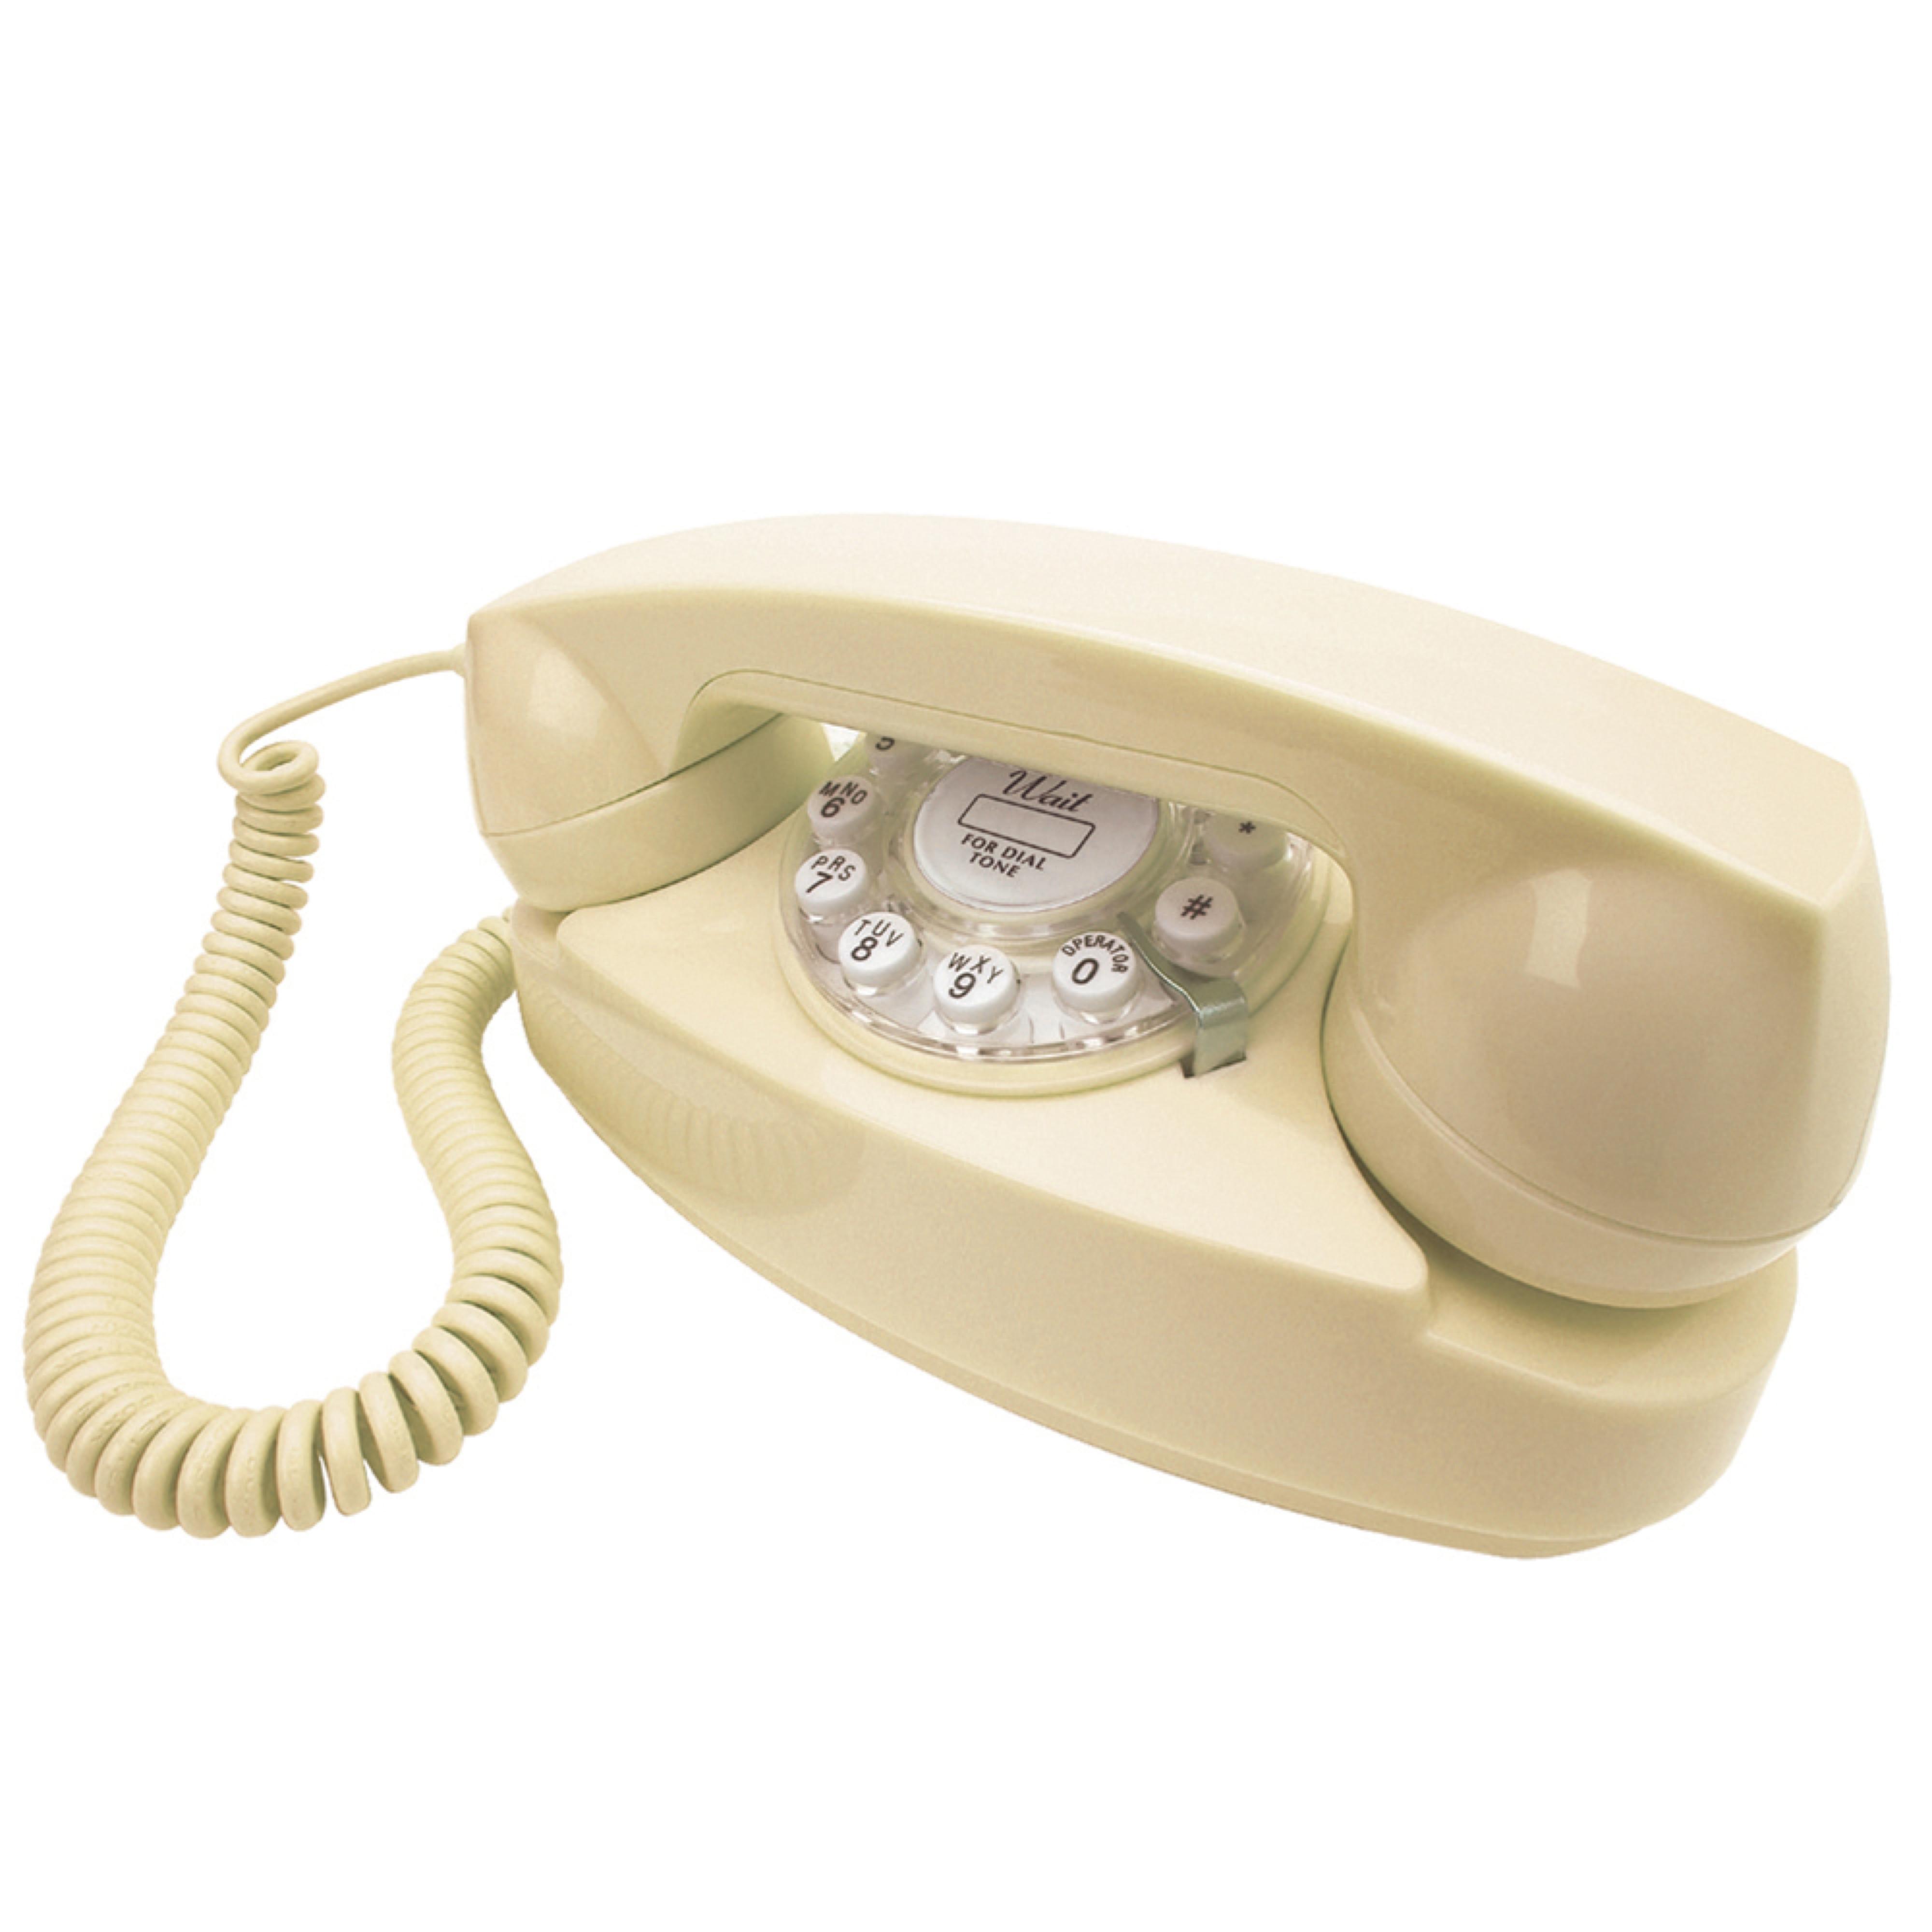 Acheter un téléphone fixe @bonjourbibiche